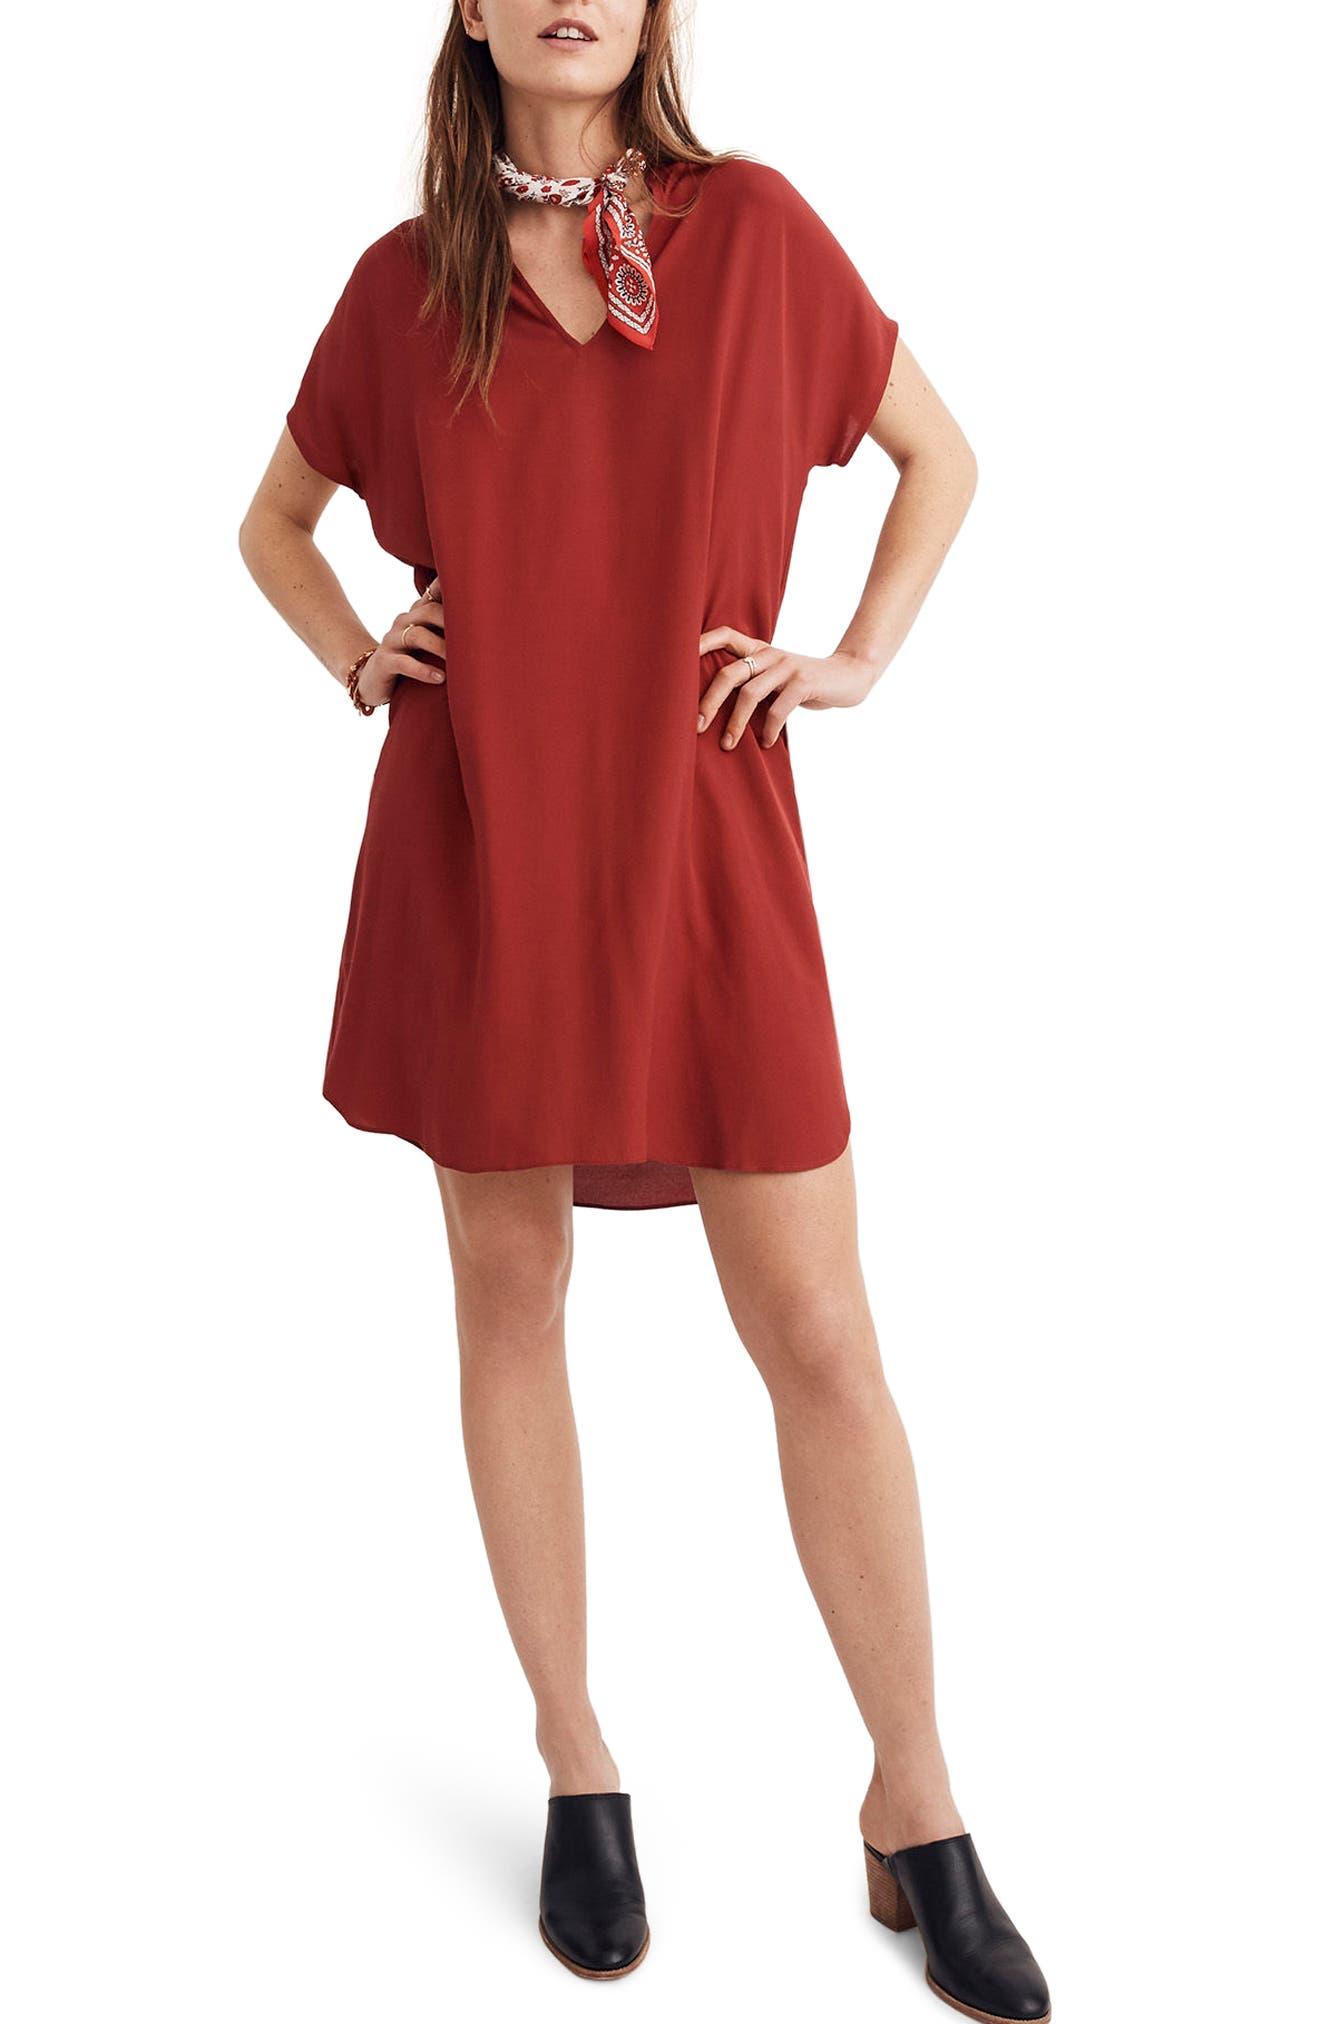 Madewell Bicoastal Dress